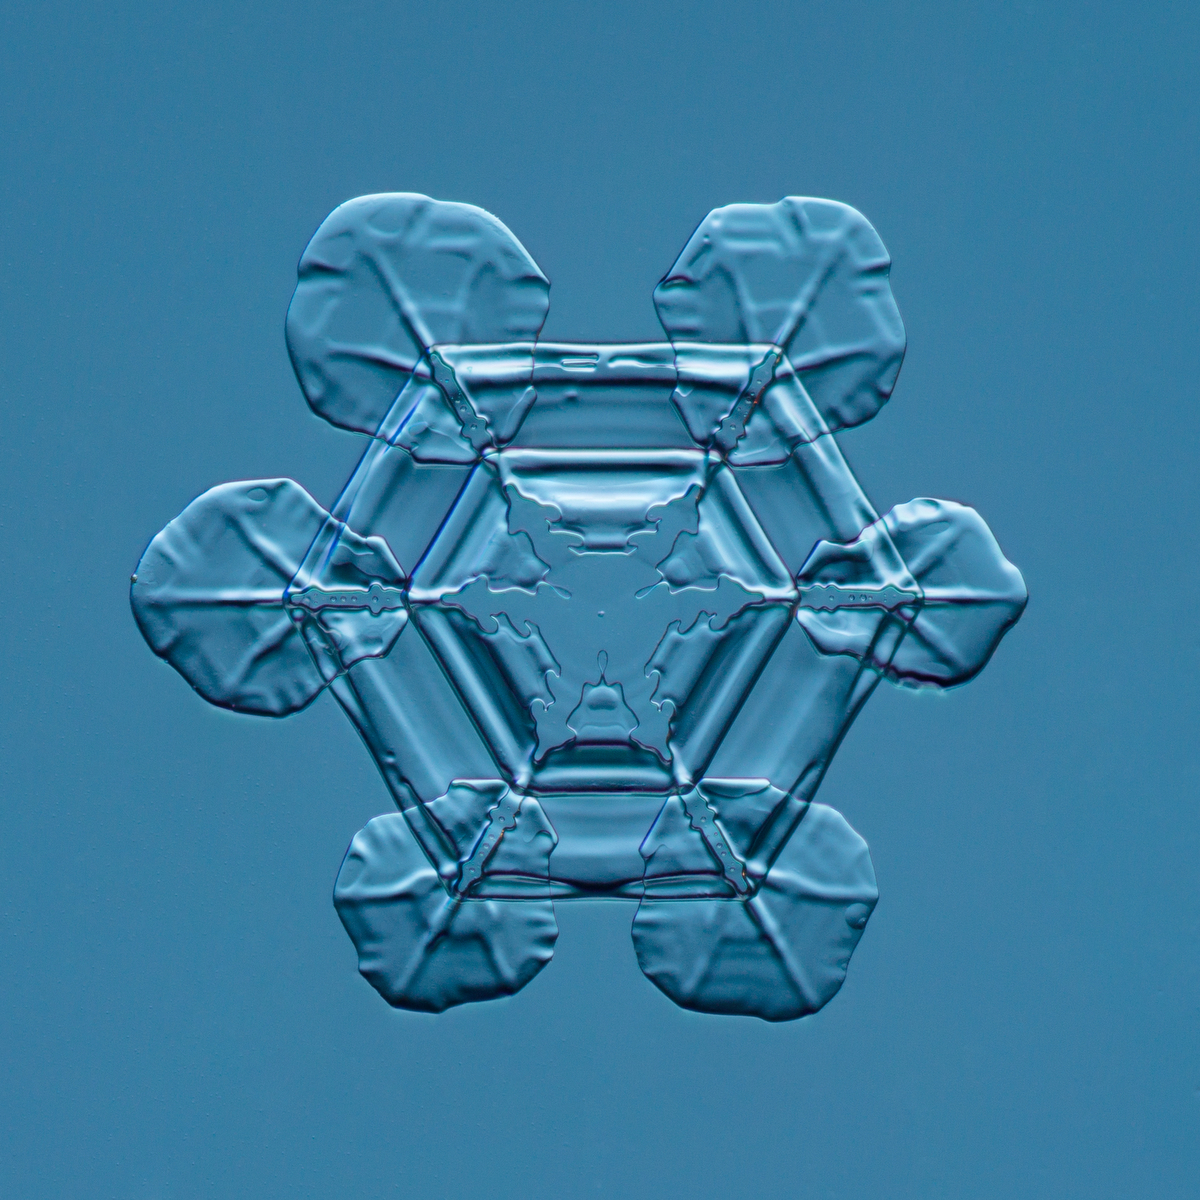 Snowflake 2015.02.25.007